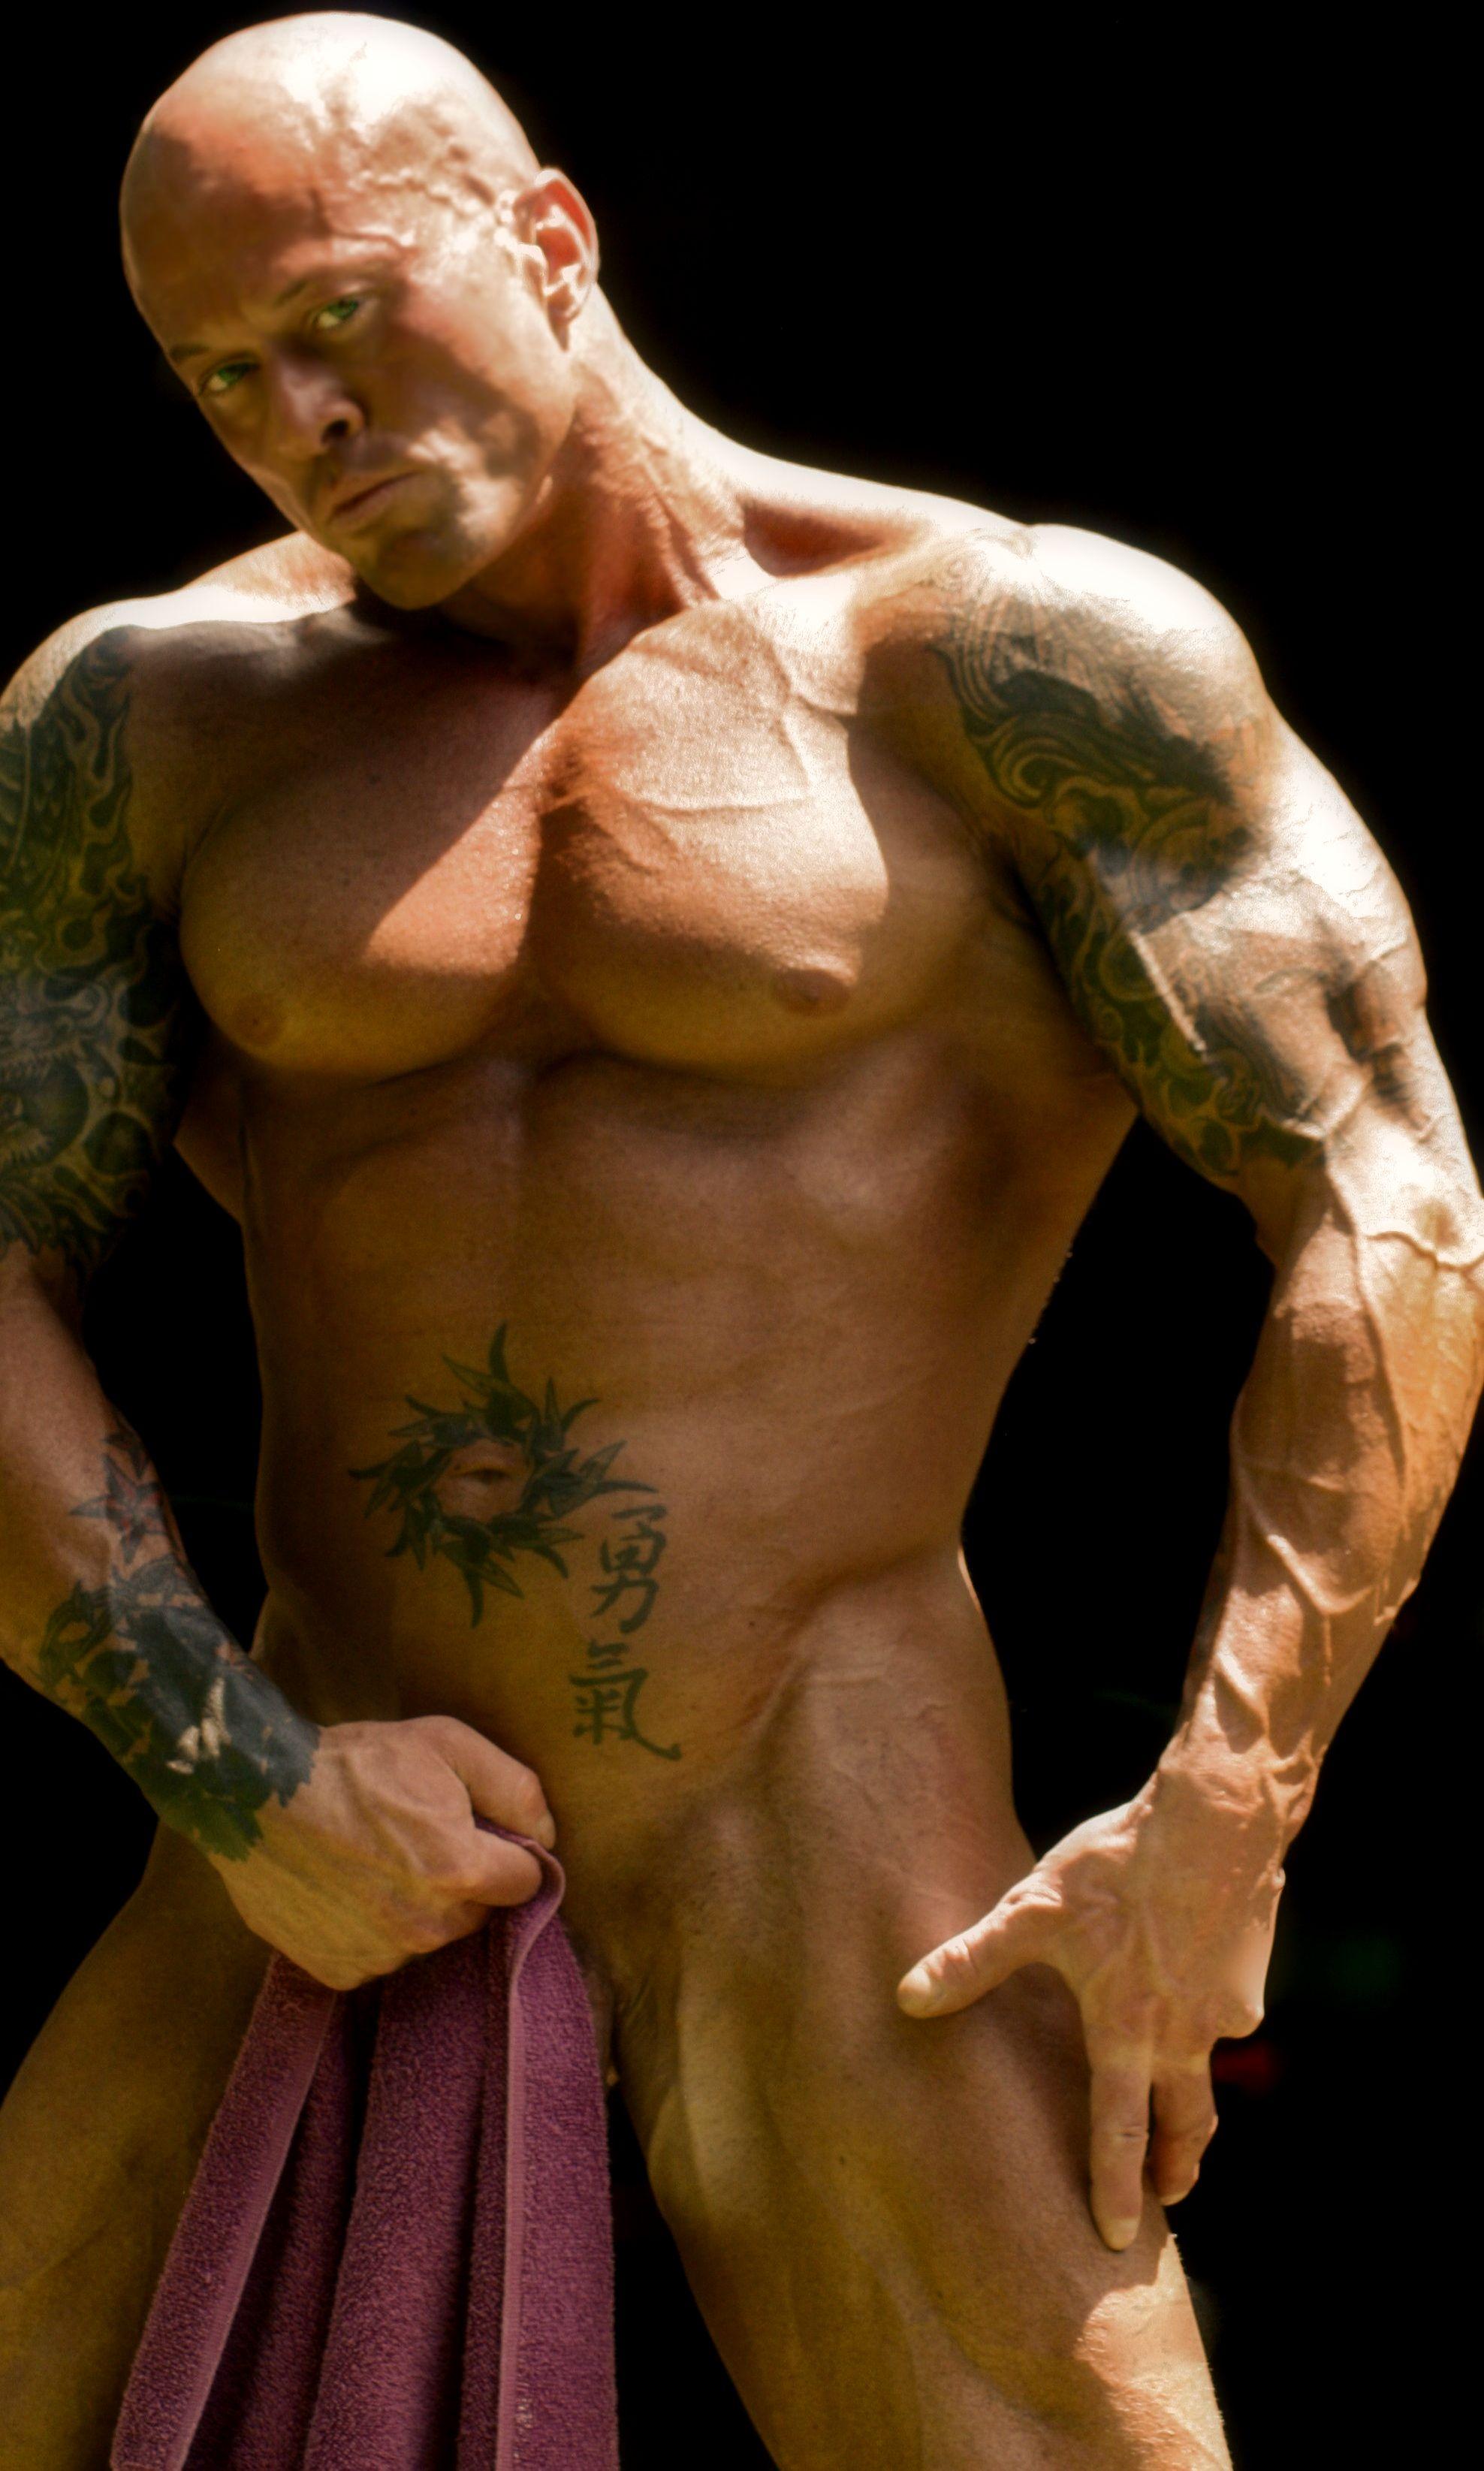 Tattooed Male Romance Fashion Physique Model John Joseph Quinlan Plagirl Theme Shoot #JohnQuinlan